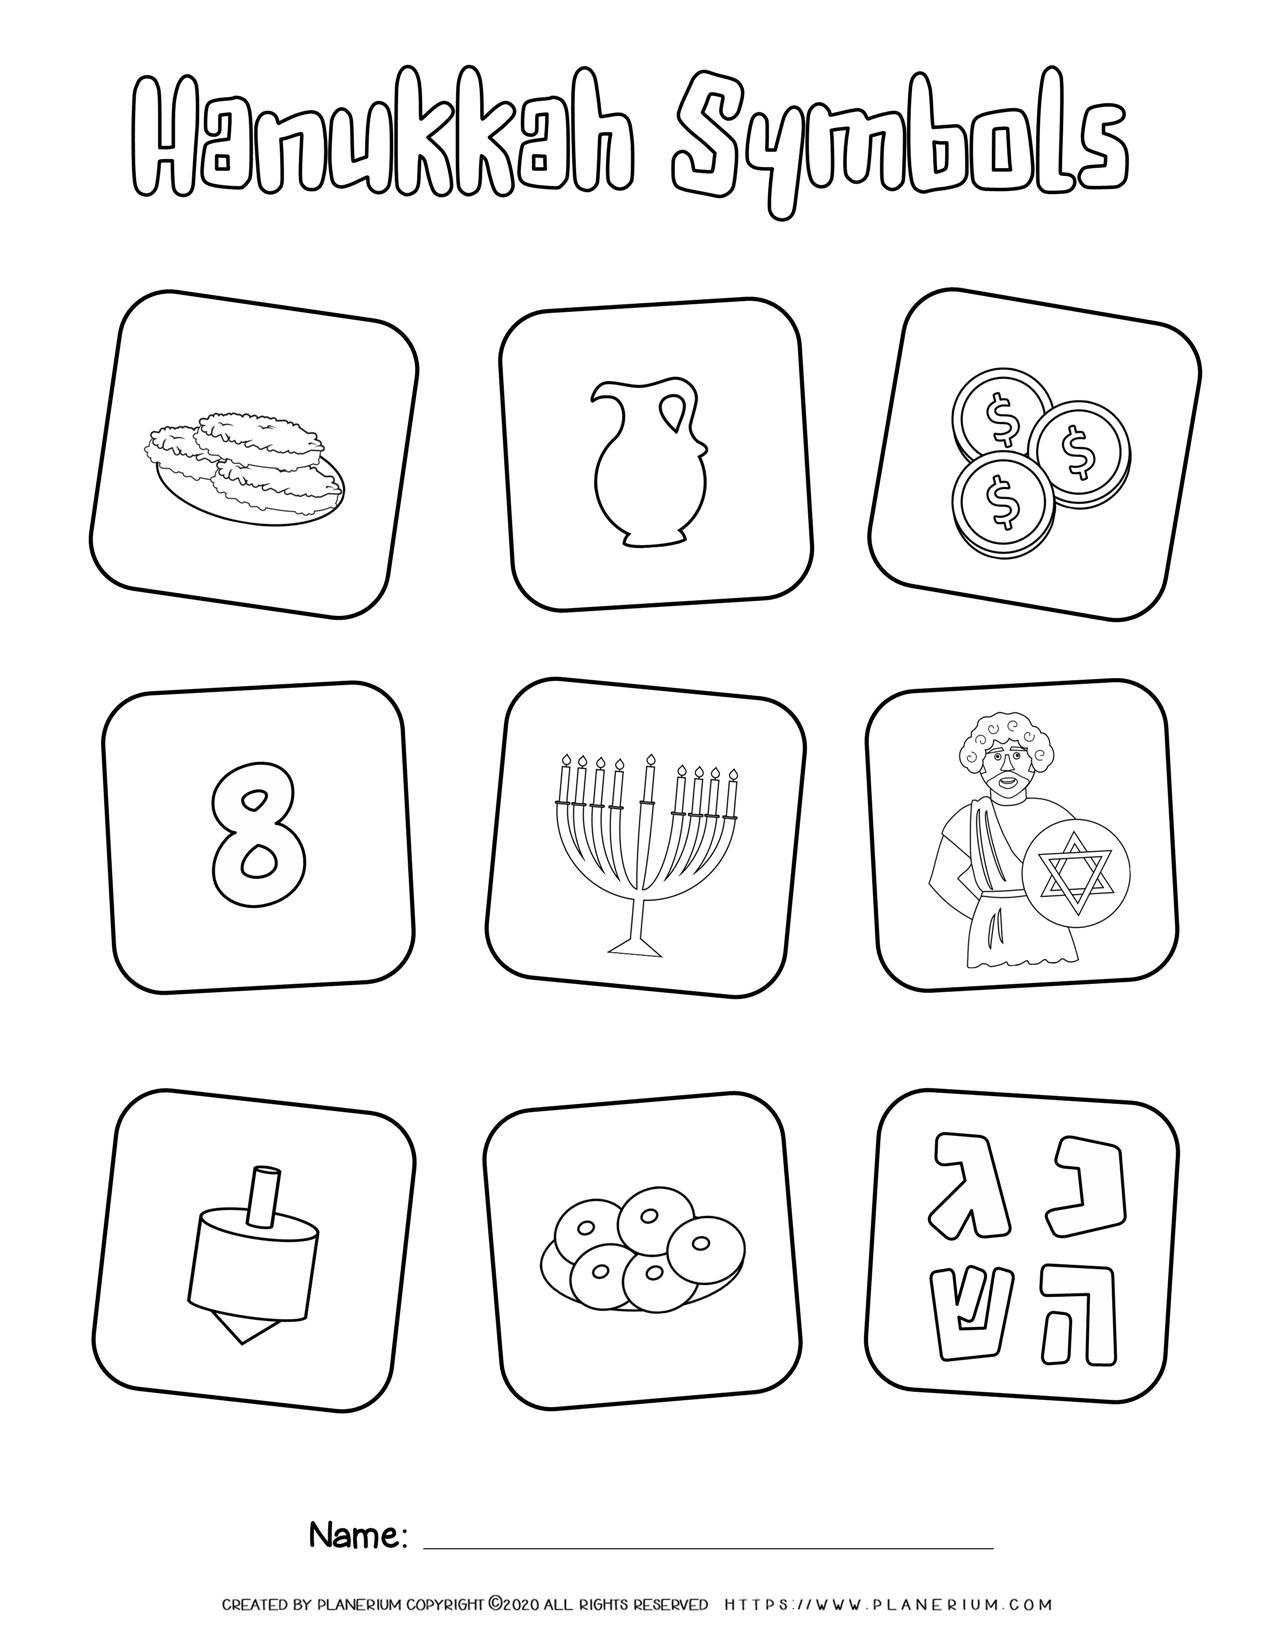 Hanukkah Symbols Coloring Page Free Printable Planerium Hanukkah Symbols Hanukkah Coloring Pages [ 1650 x 1275 Pixel ]